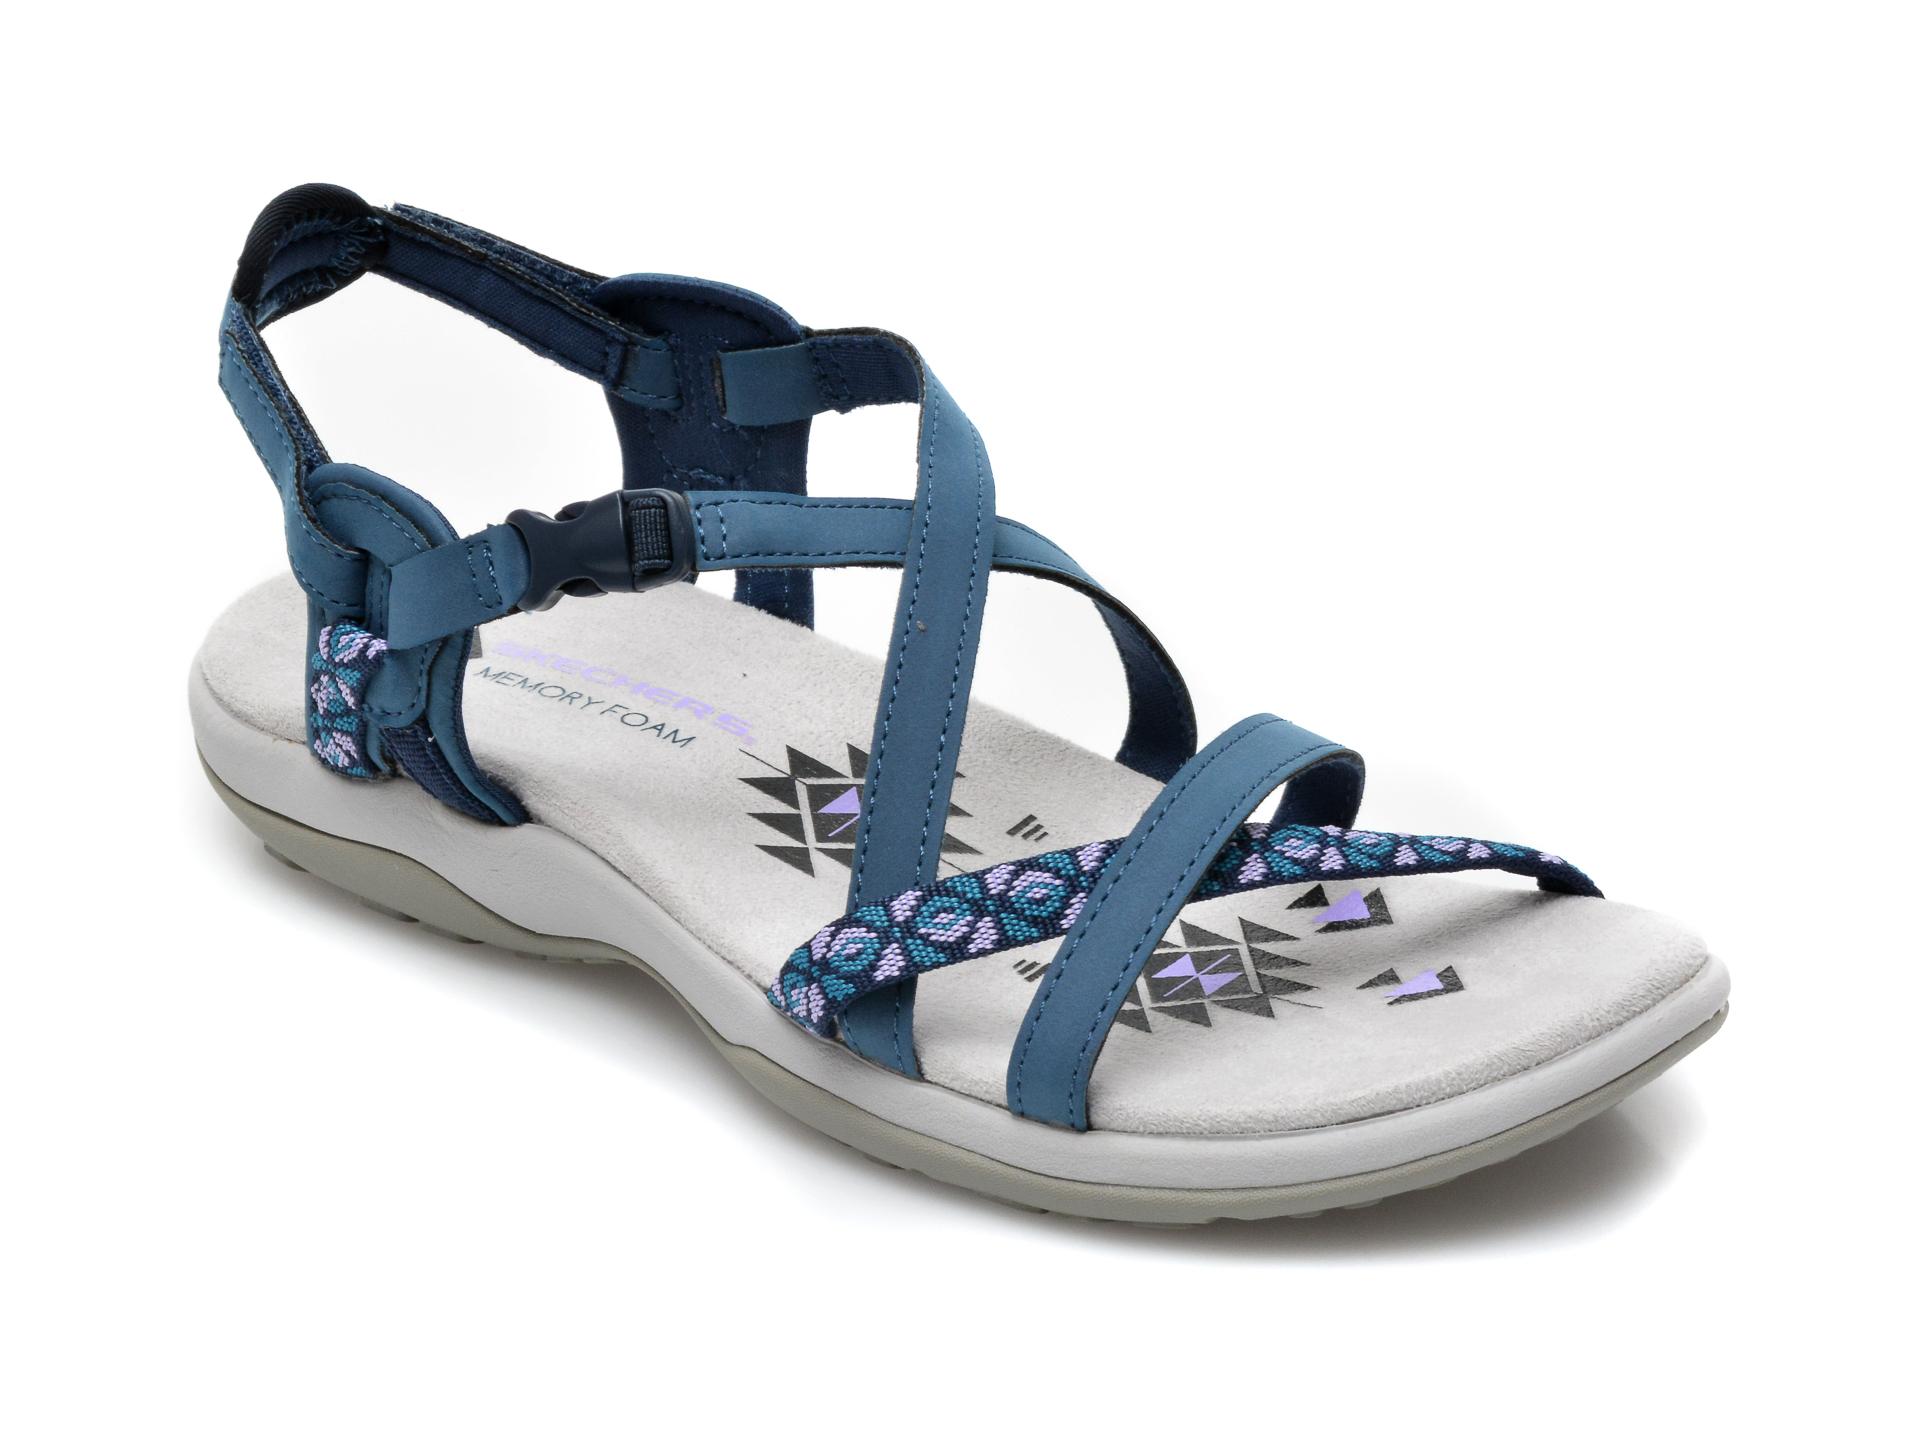 Sandale SKECHERS bleumarin, 40955, din piele ecologica imagine otter.ro 2021